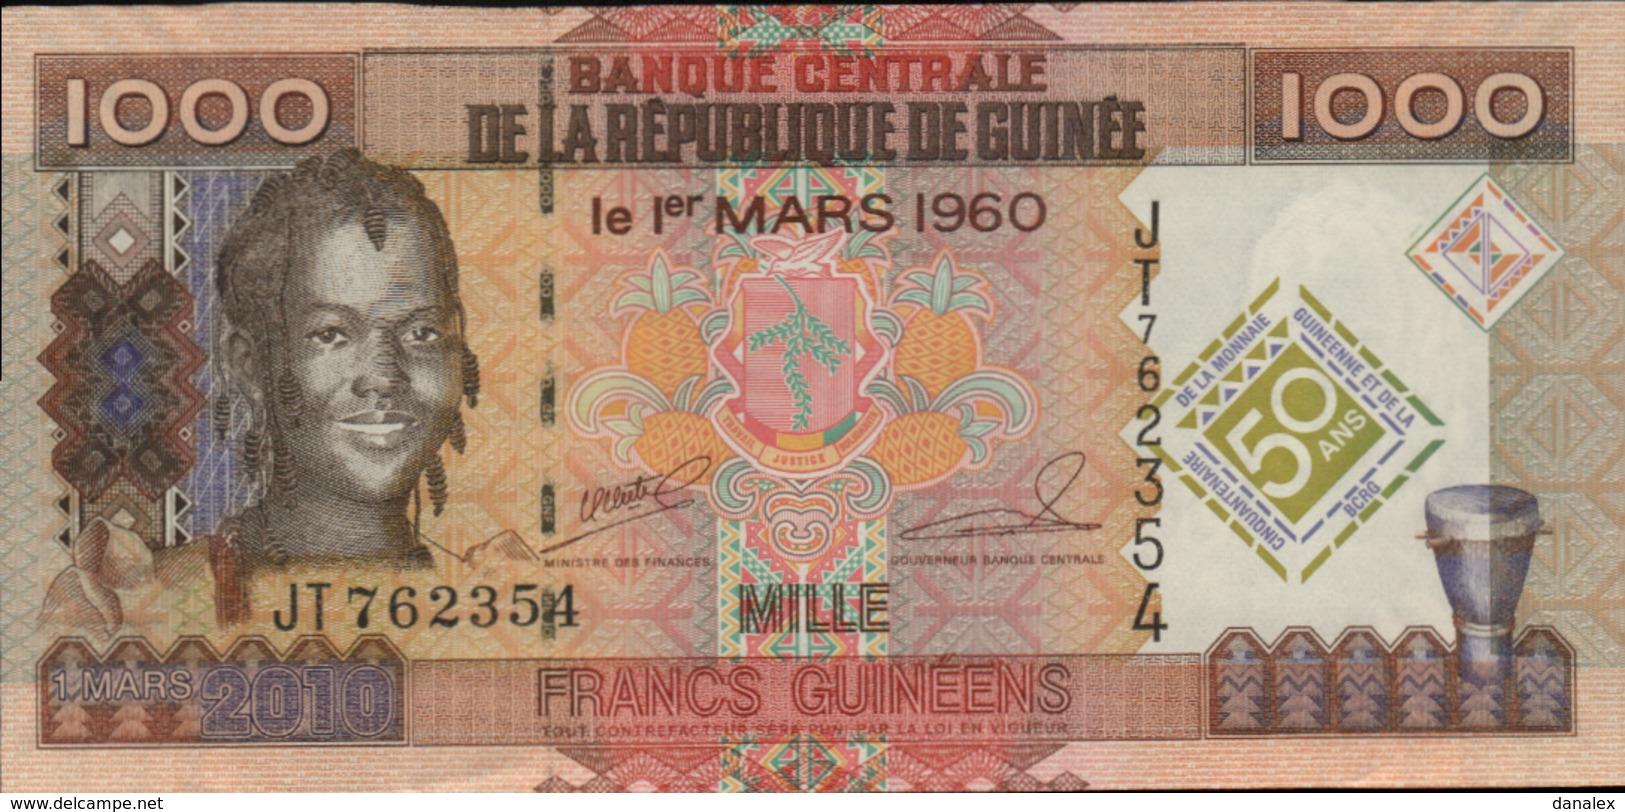 GUINEE 1000 FRANCS GUINEENS De 1-03-2010 PICK ? UNC/NEUF - Guinée